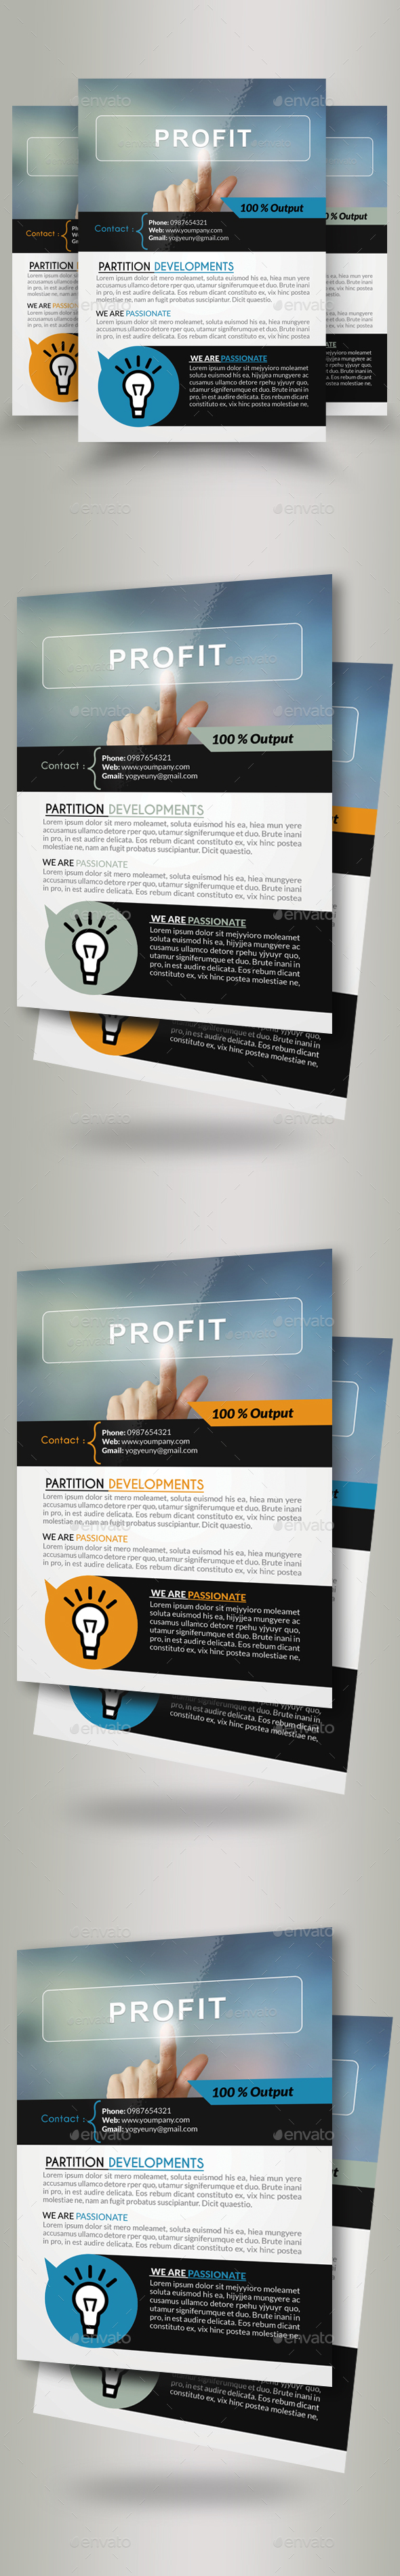 Business Profit Idea Flyers - Corporate Flyers